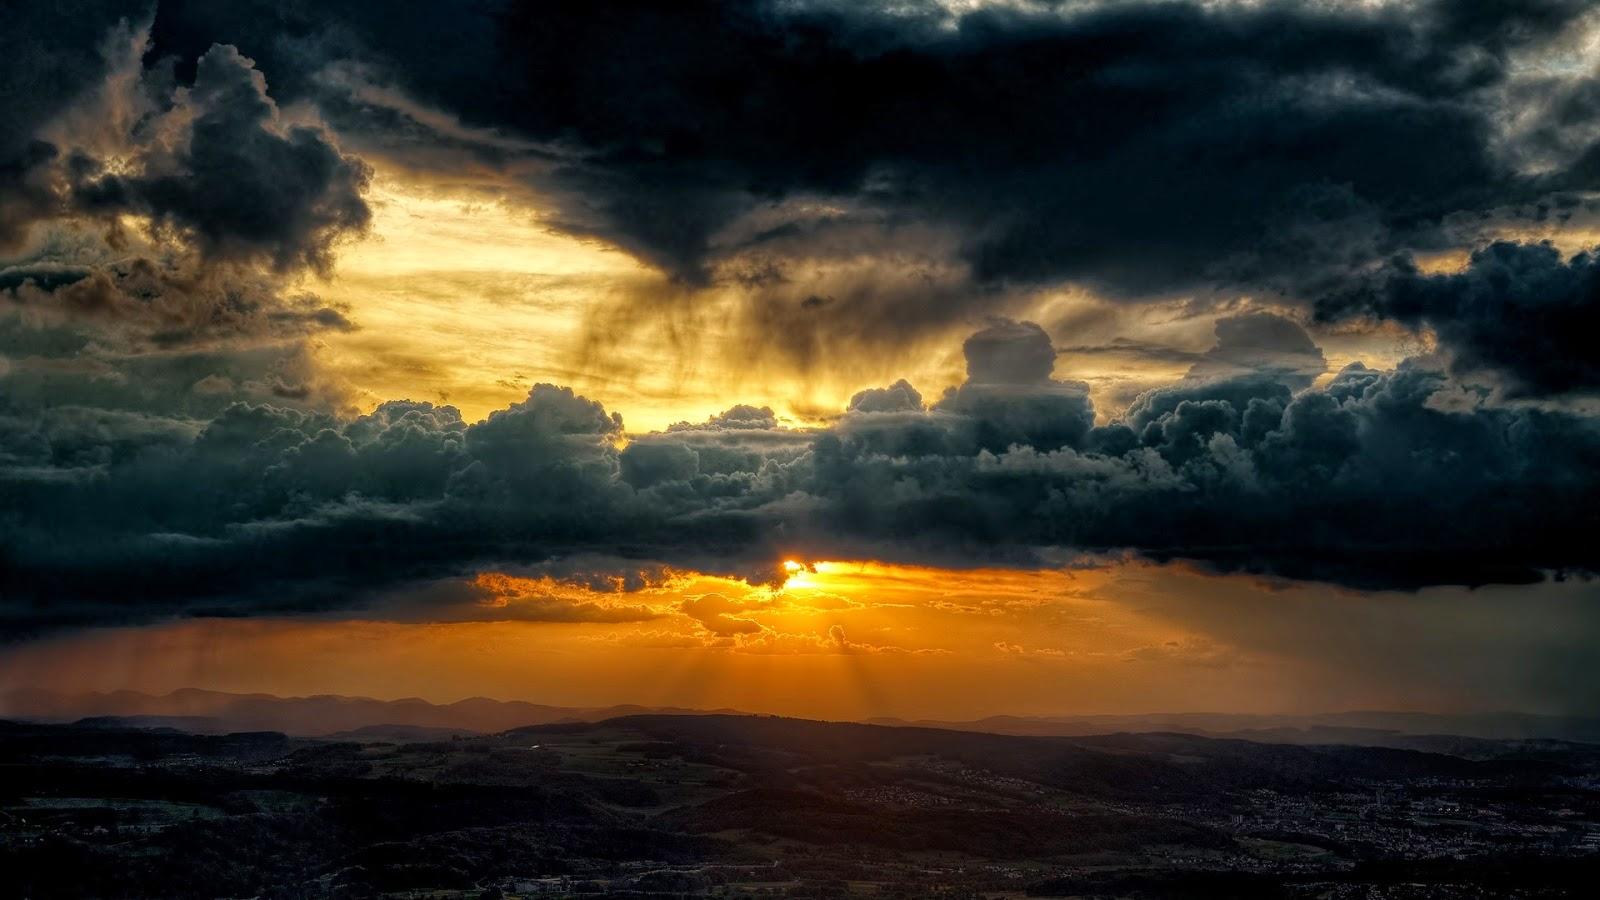 dark_clouds_sky_sun-1600x900.jpg